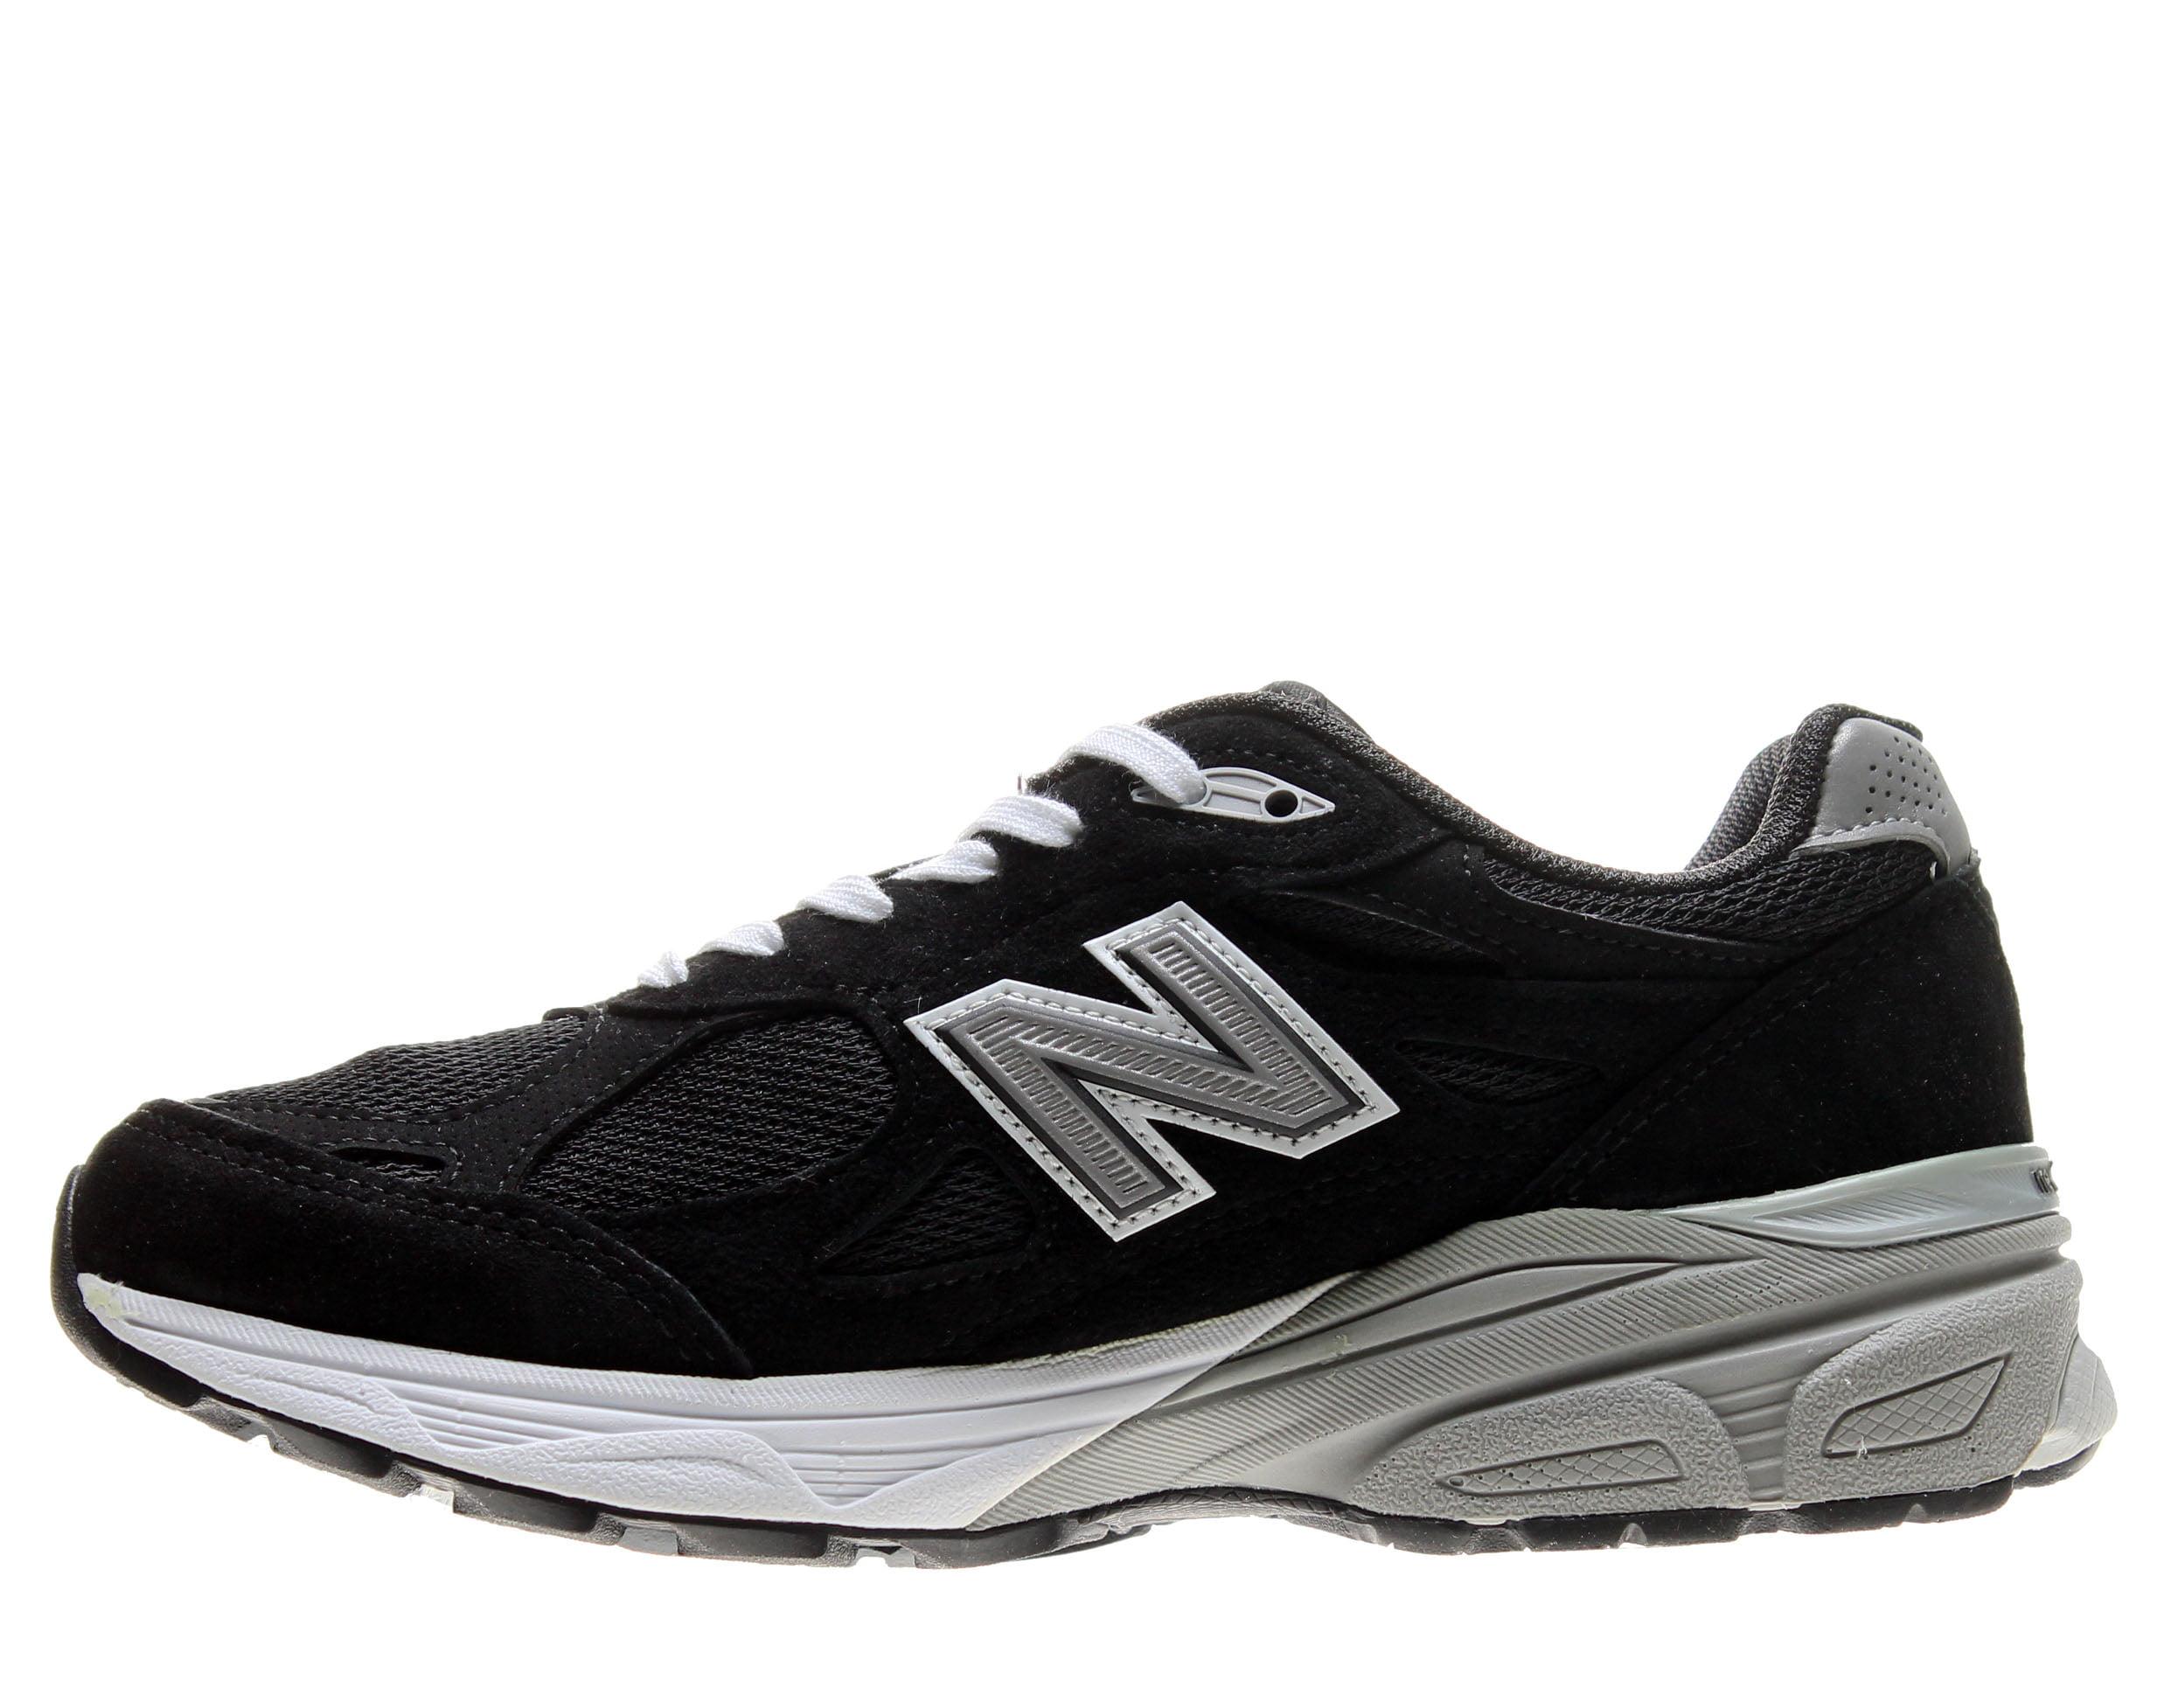 New Balance 990v3 Black/Grey Women's Running Shoes W990BK3